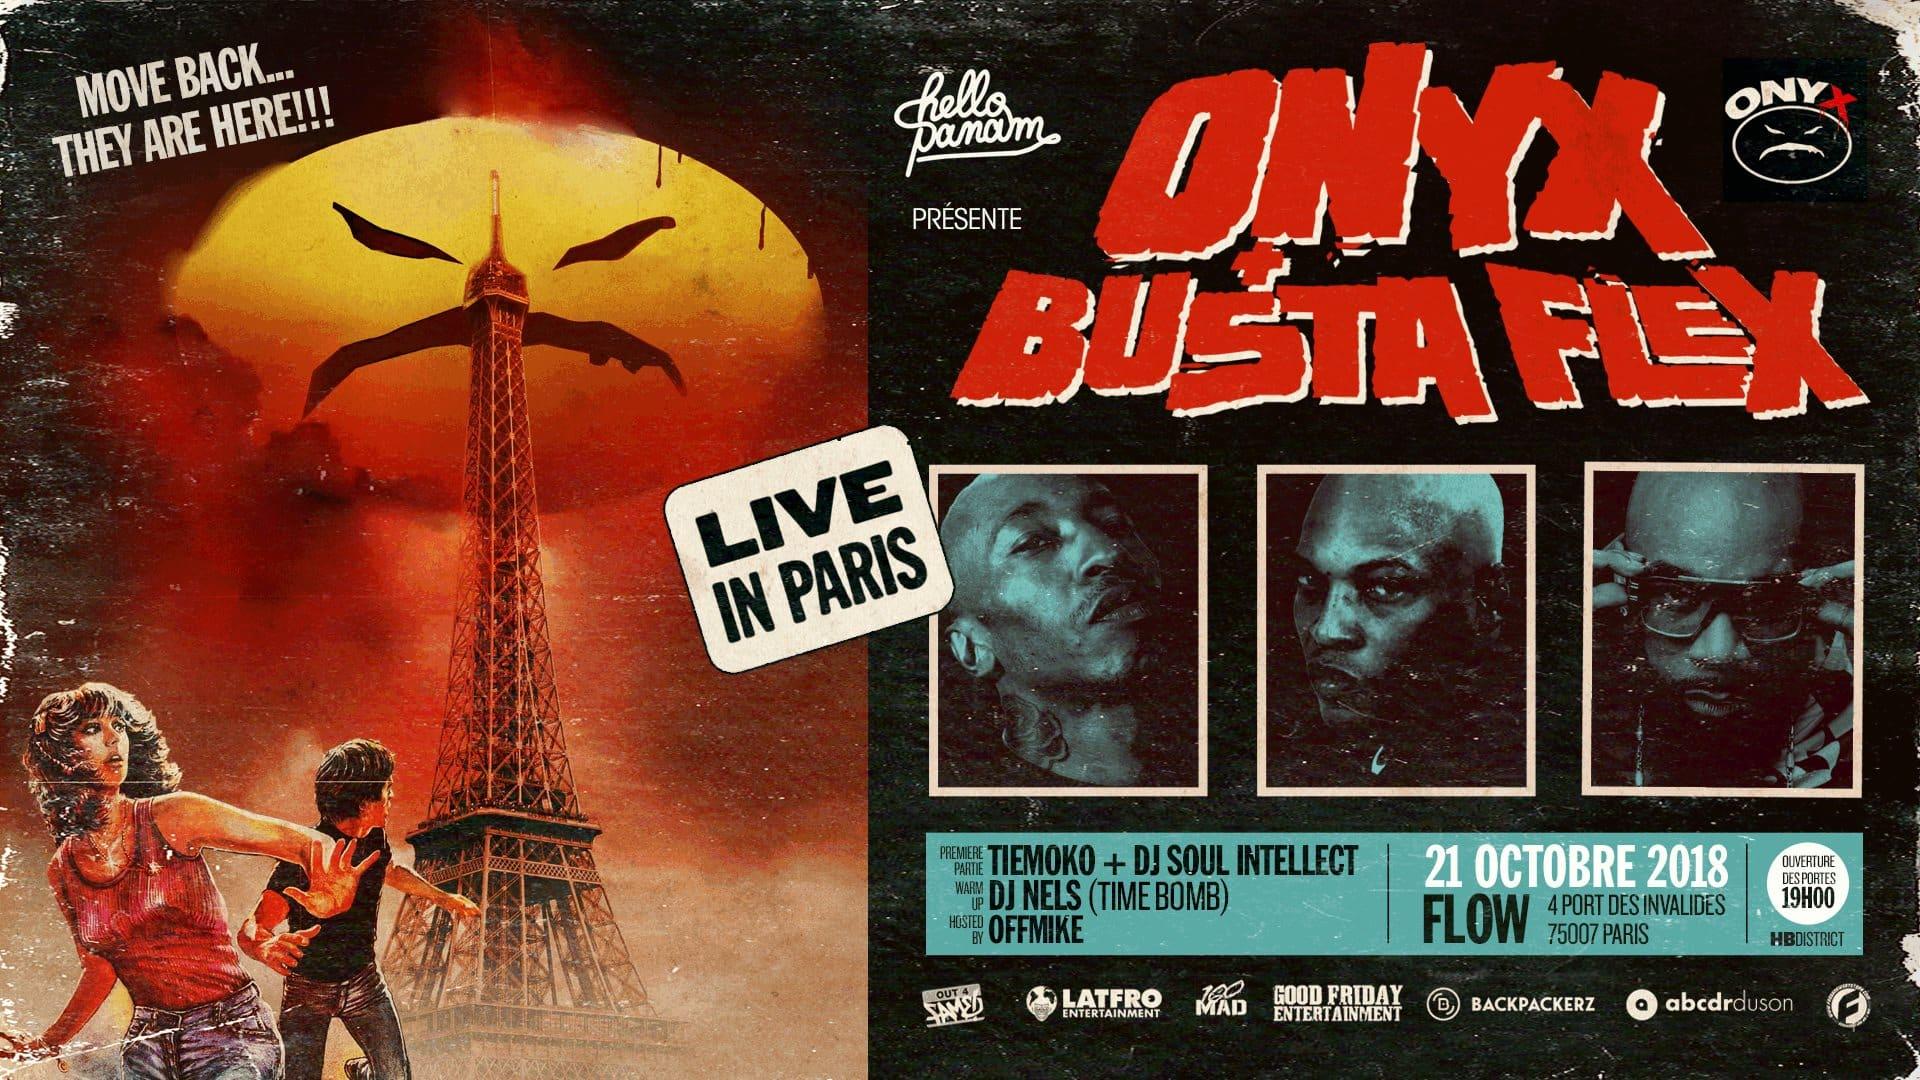 image onyx & busta flex concert 2018